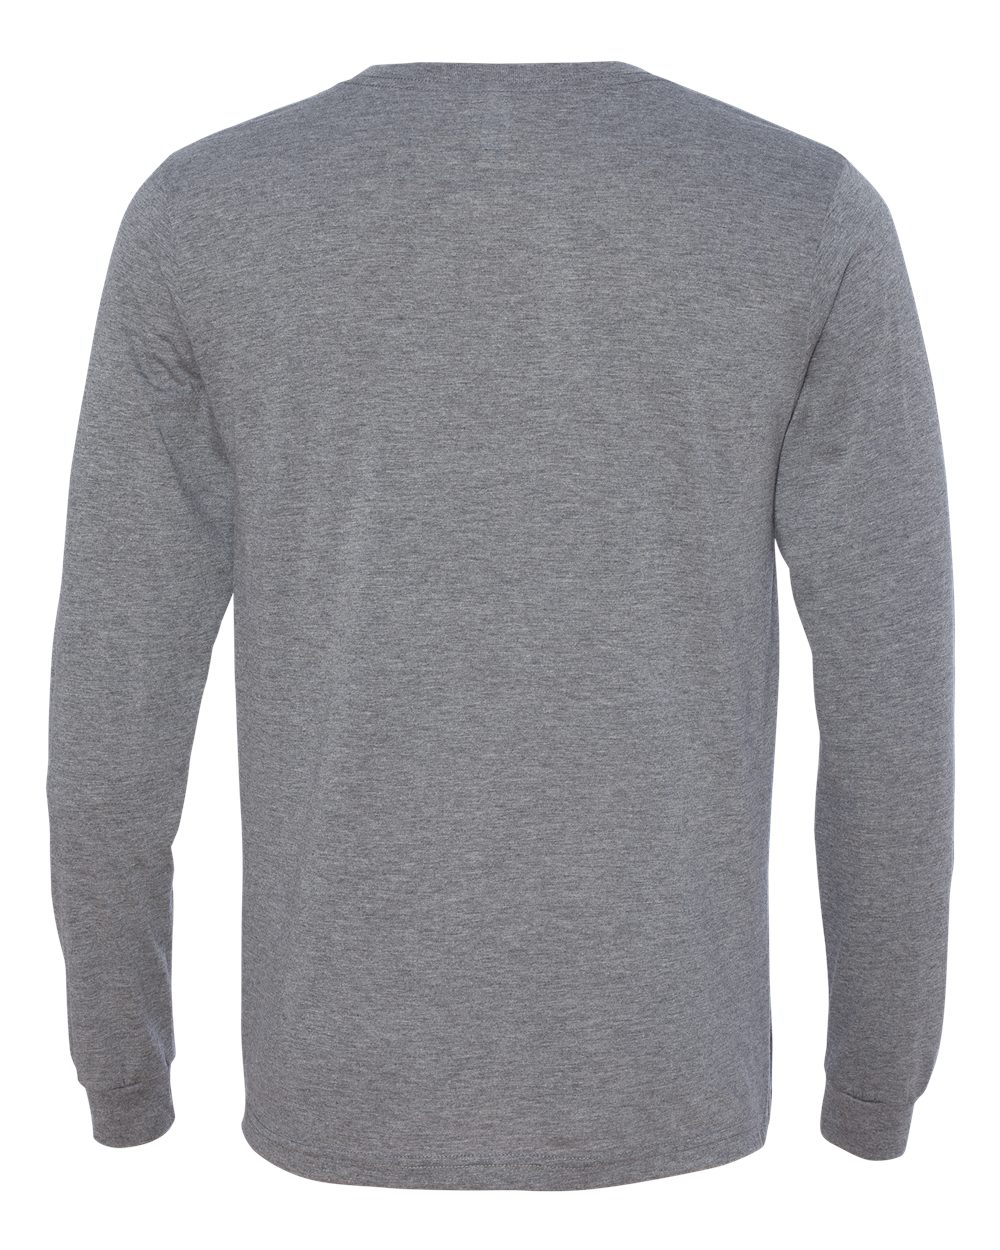 Bella-Canvas-Mens-Blank-Top-Long-Sleeve-Jersey-Tee-T-Shirt-3501-up-to-3XL thumbnail 50